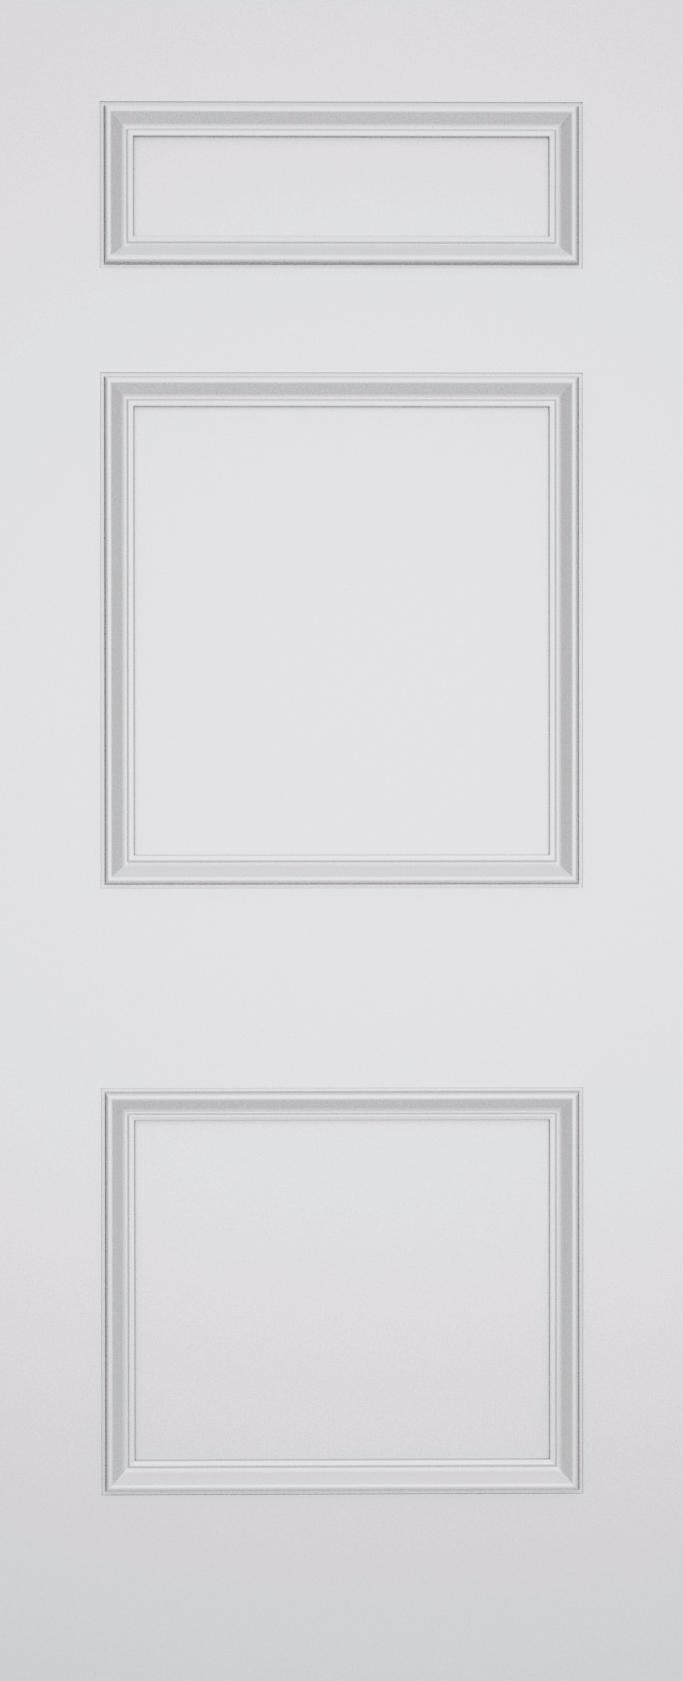 Ashbury Knightsbridge 3 Panel Fire Door